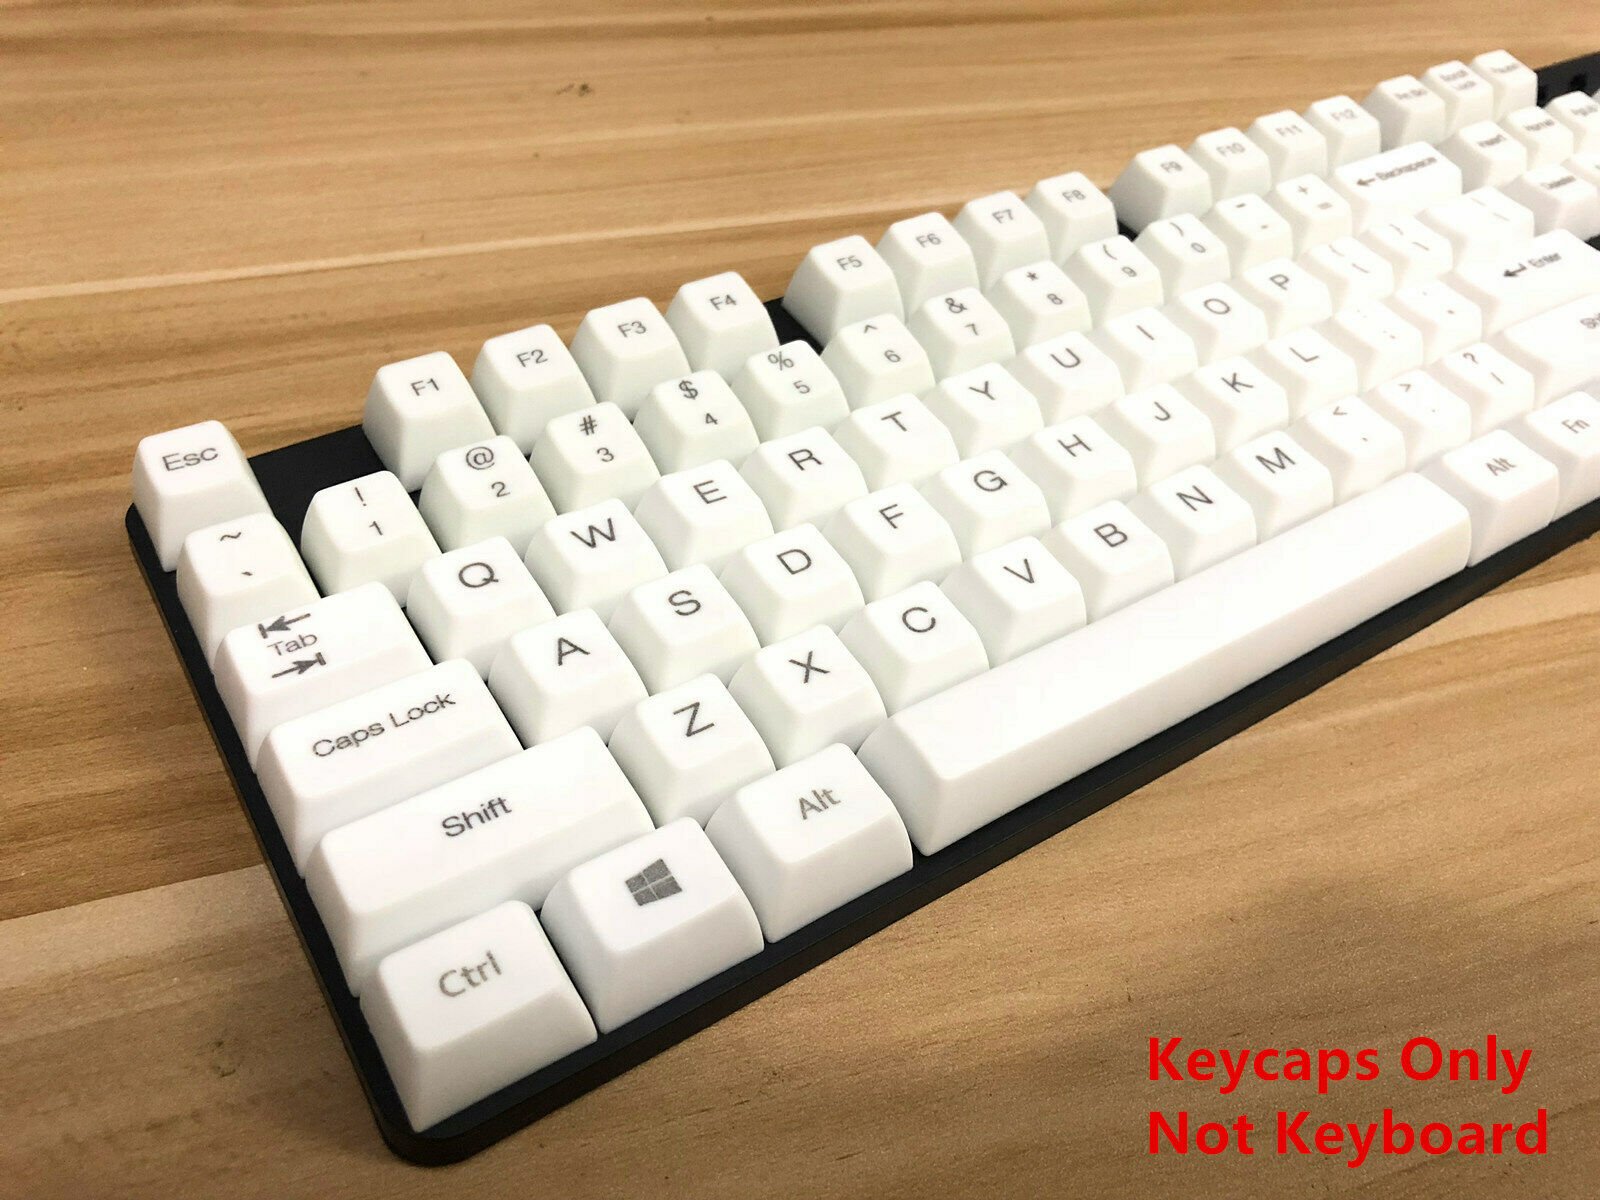 Axis Body : XDA Profile, Color : 104 Keys no Printed Keyboard keycaps 1 Set of 60//87//104 Key Obsidian Style PBT Dye Sublimation Keycap Mechanical Keyboard MX Key Cap